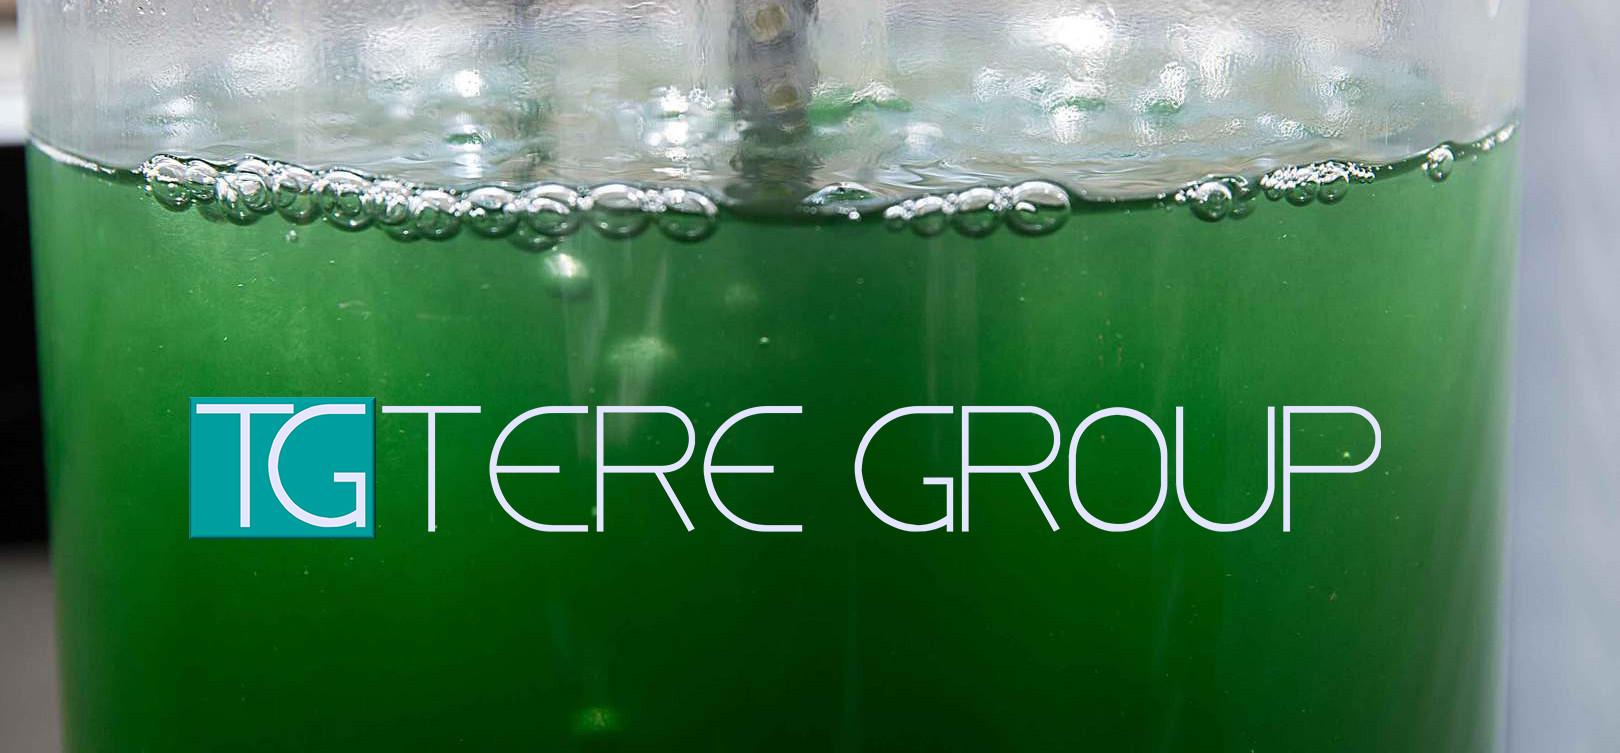 Impianti per microalghe | Tere Group srl